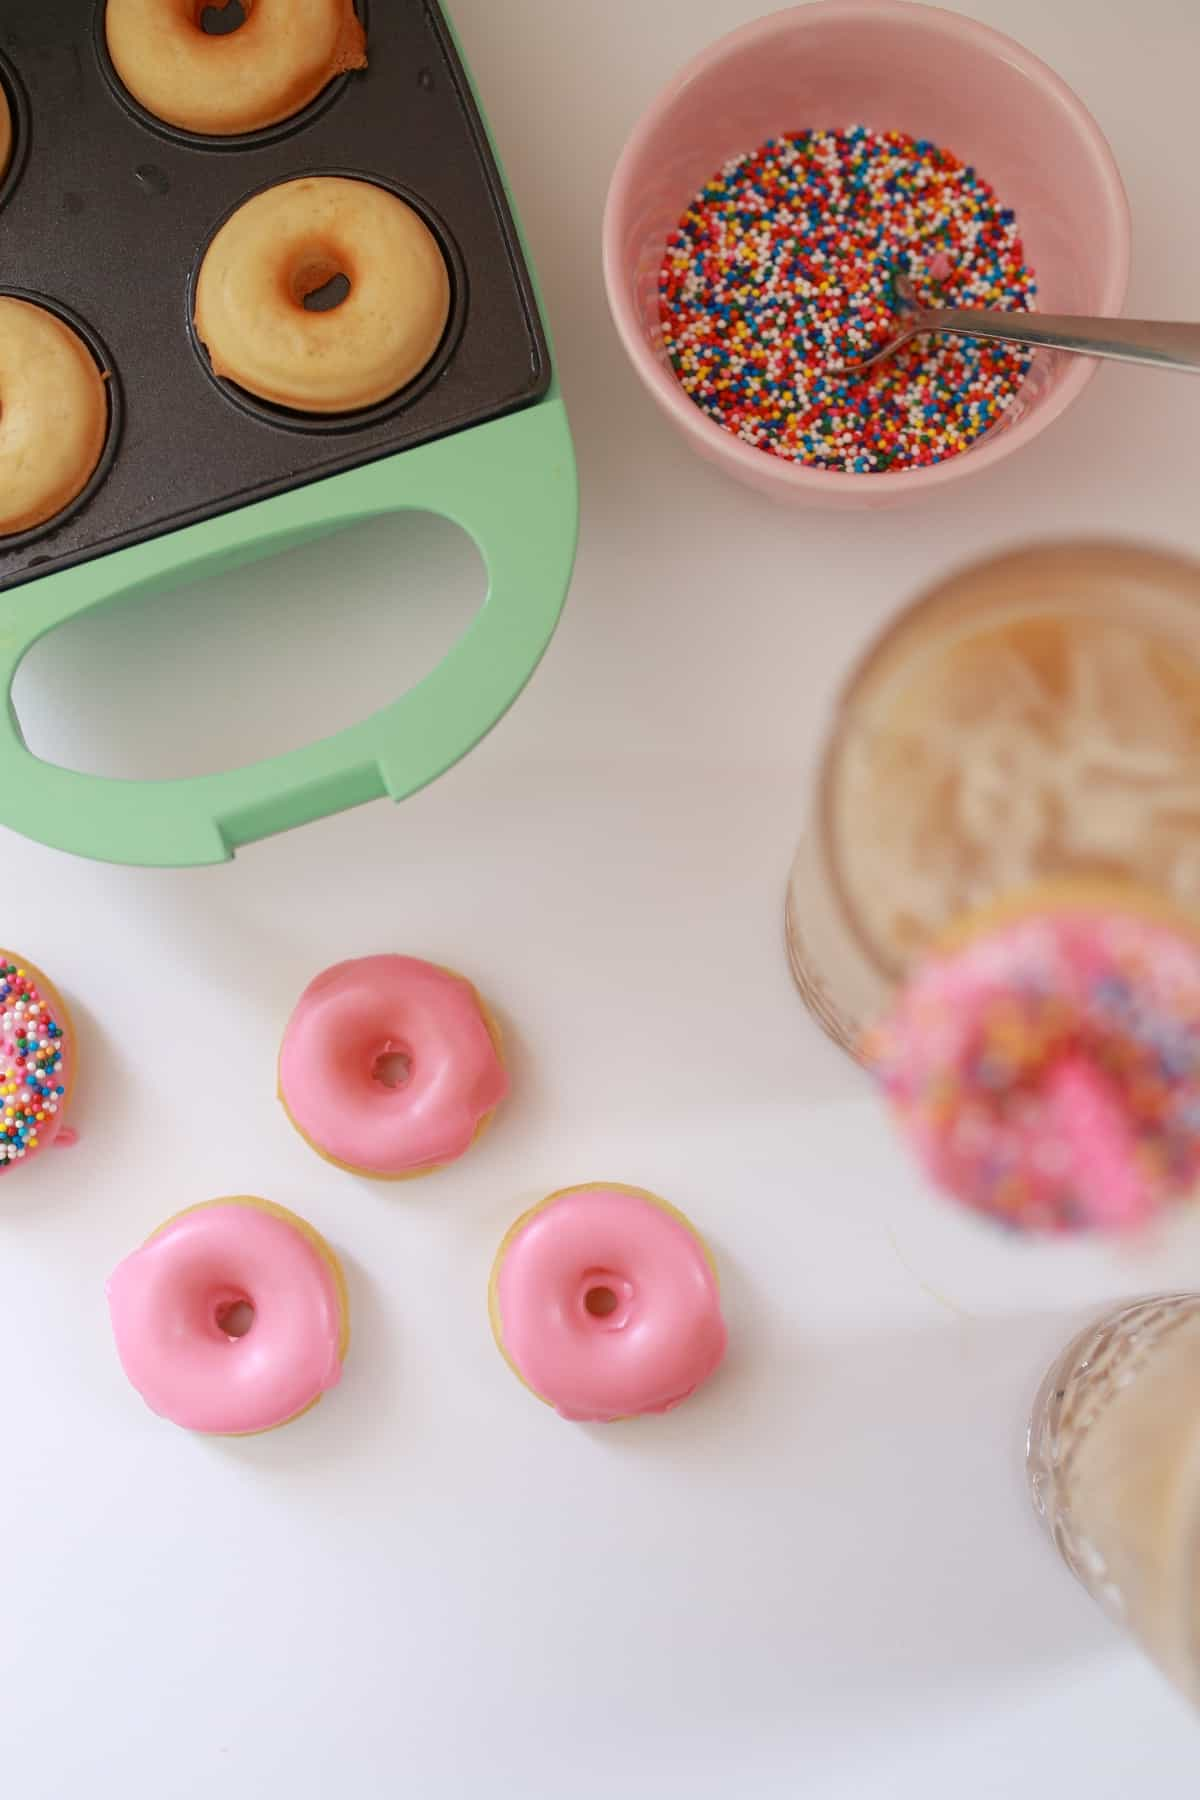 mini donut recipe - My Style Vita @mystyelvita - 1 (2)